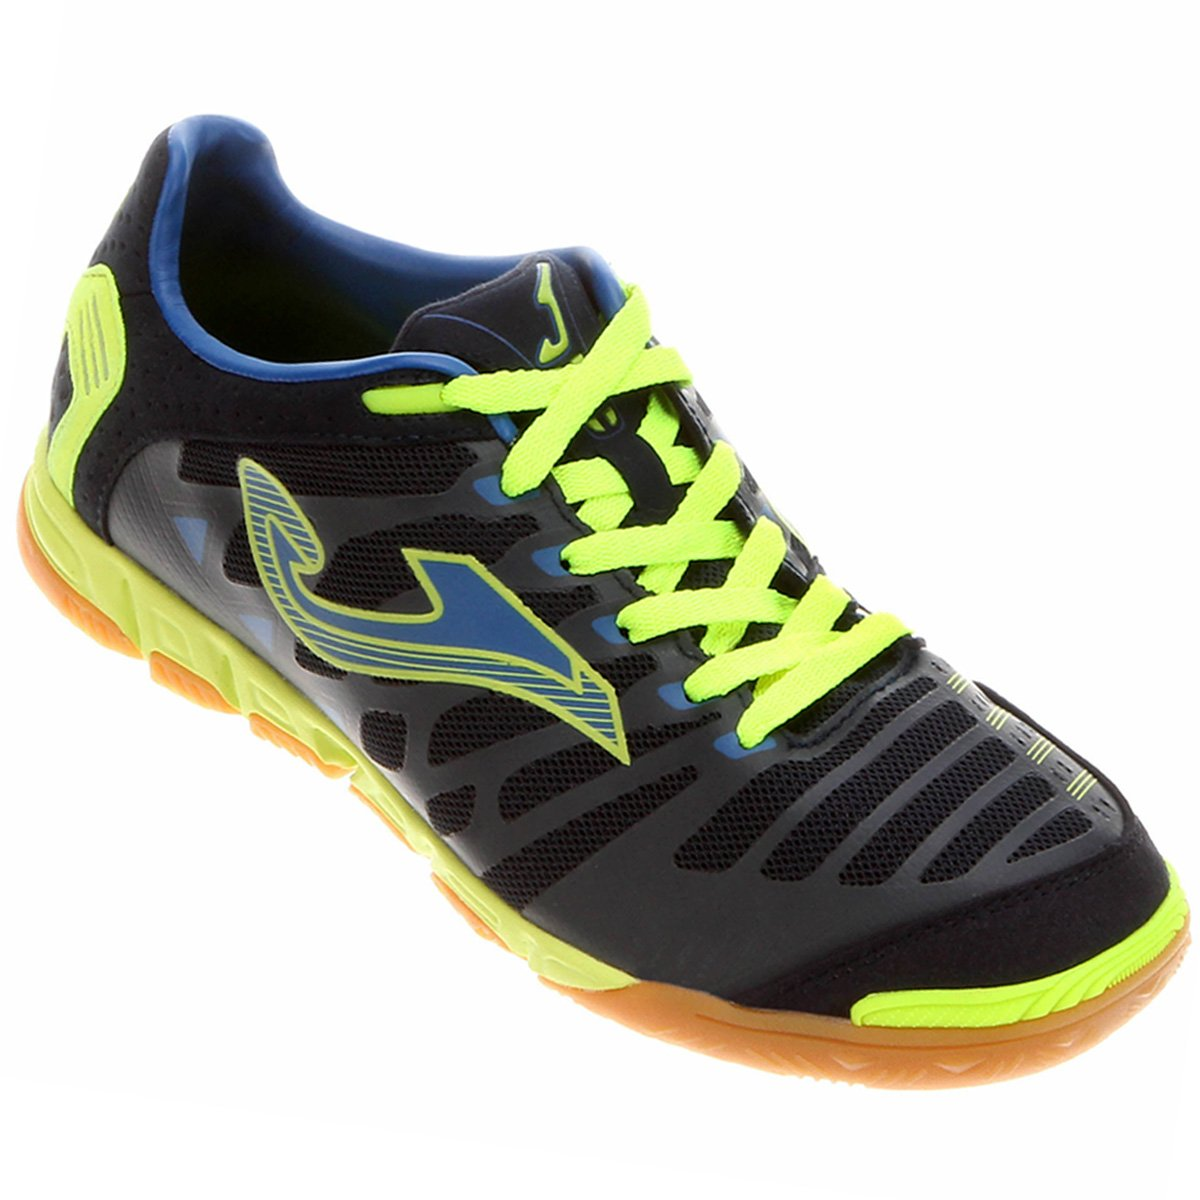 a8aa14b49d Chuteira Joma Super Regate Futsal - Compre Agora